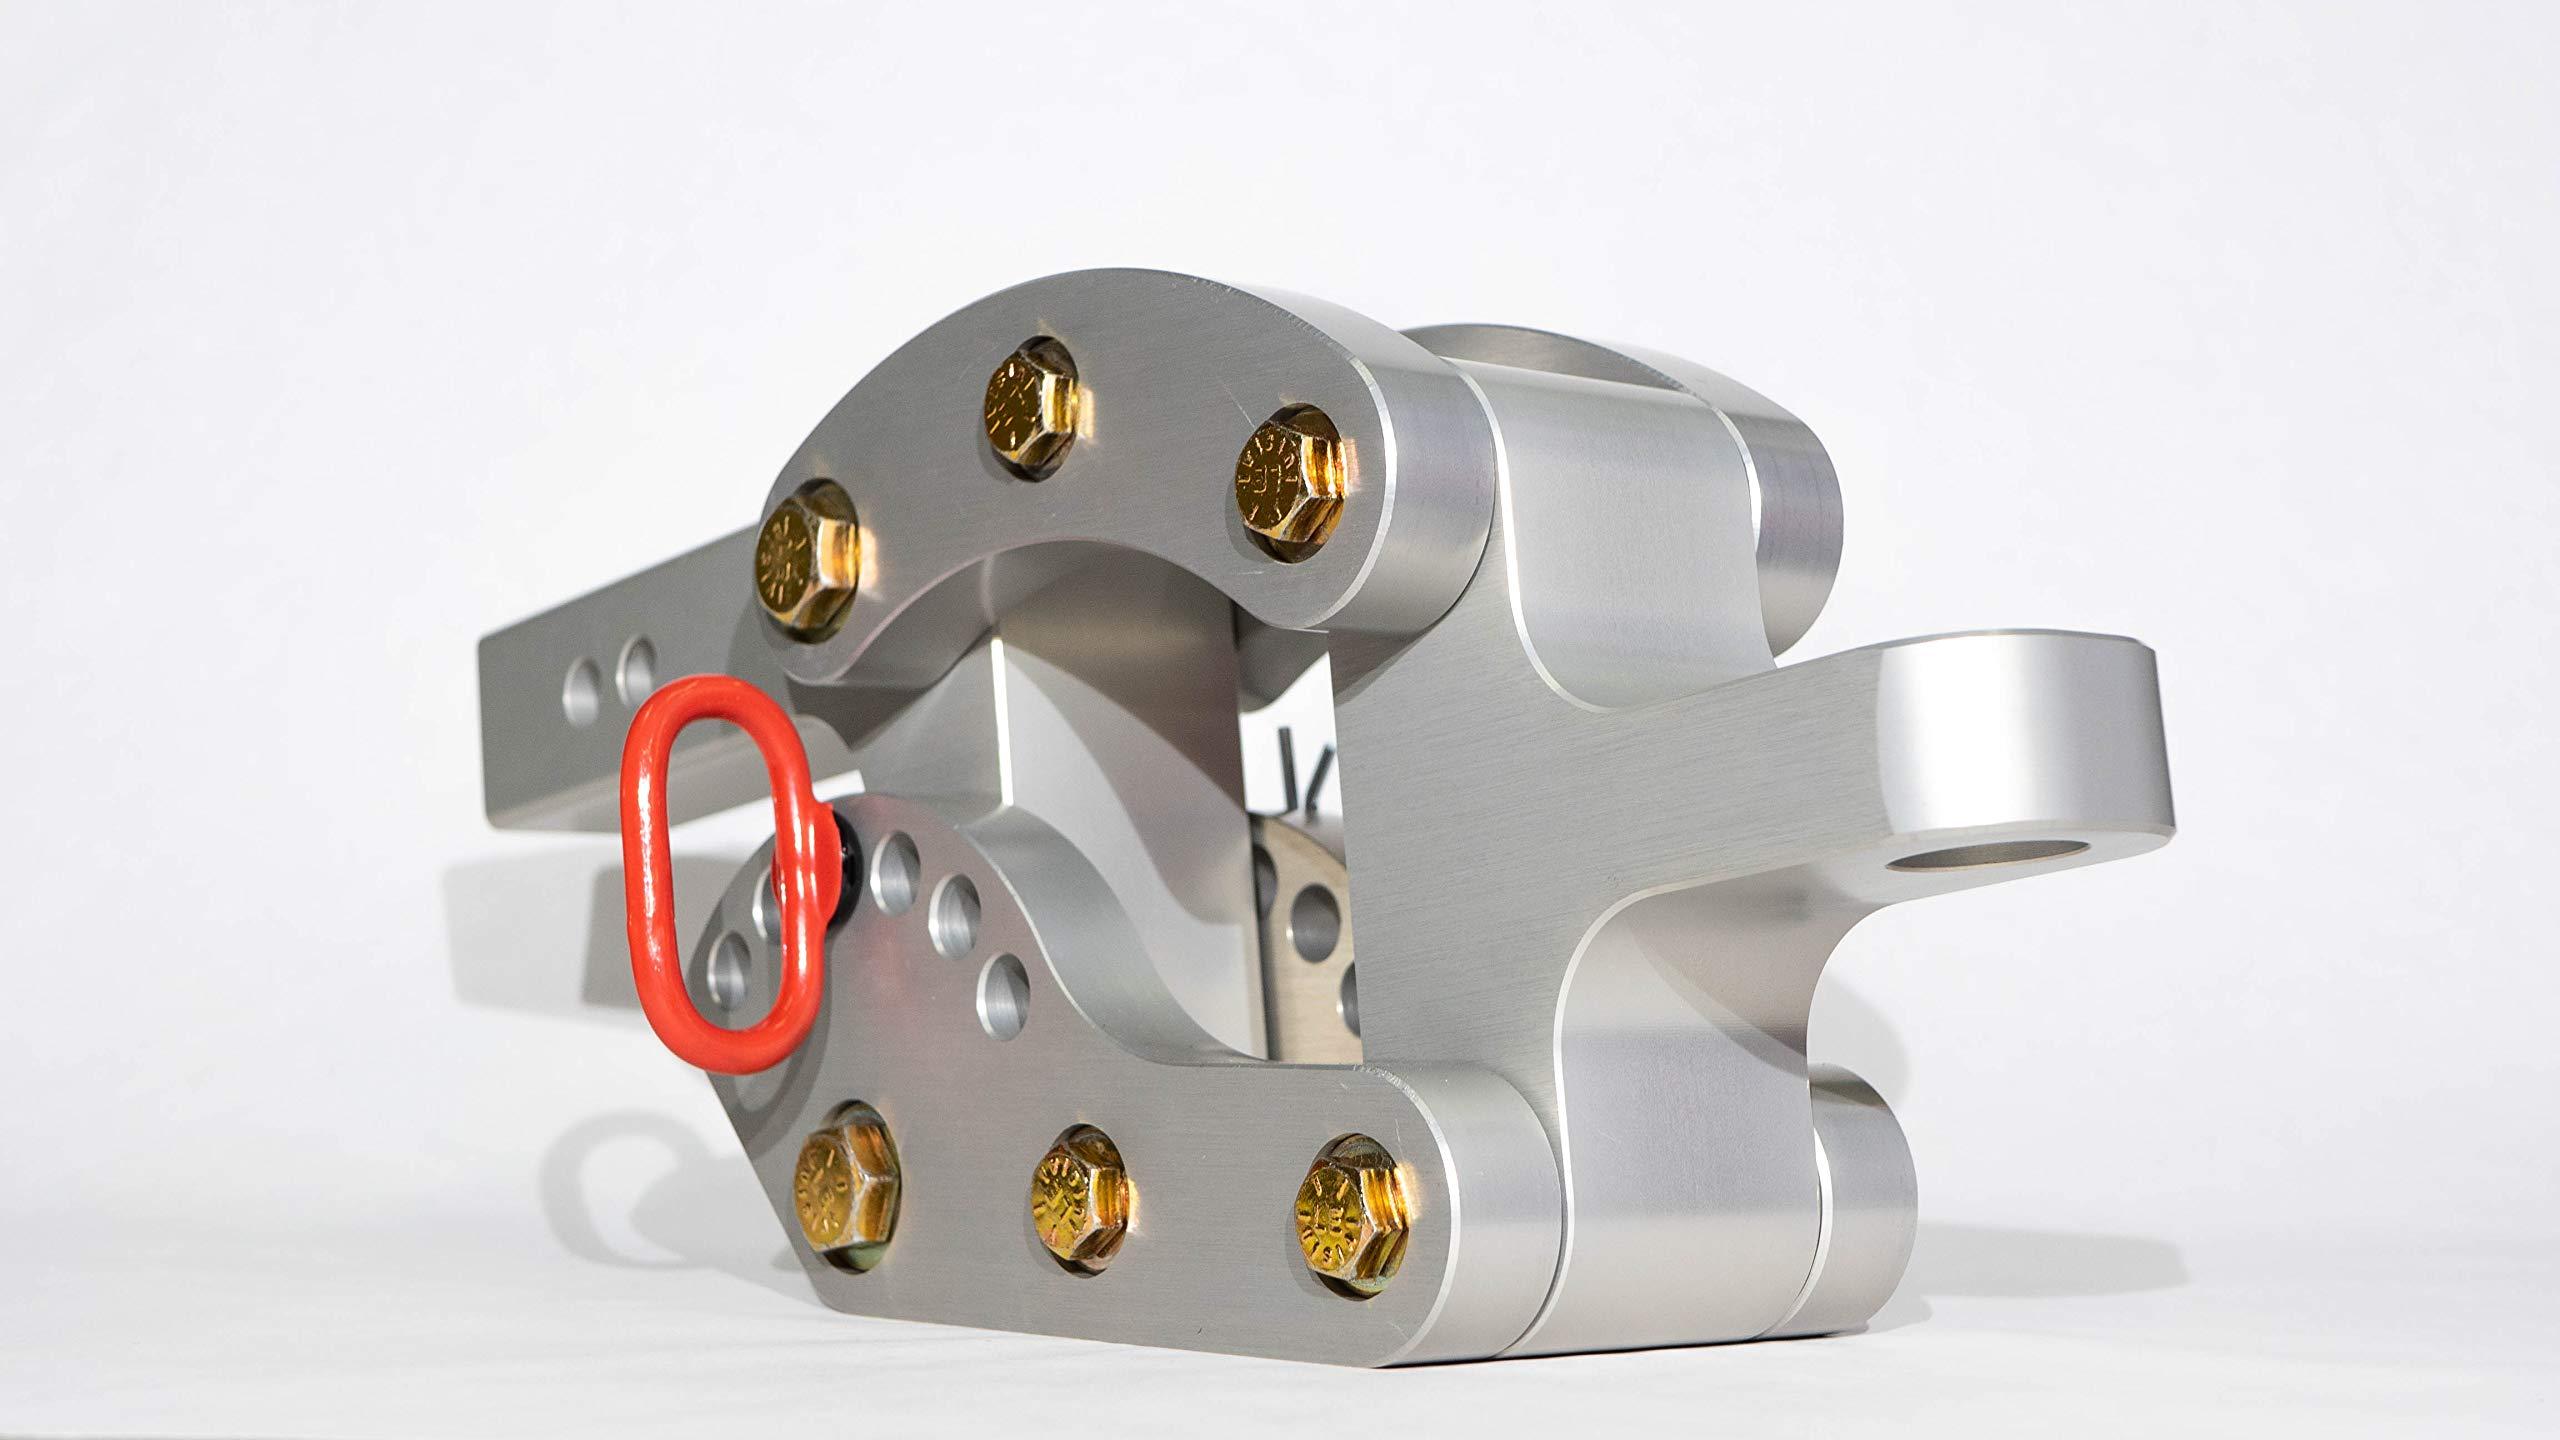 Rhino Hitch 2.5″ Aluminum Adjustable Hitch by Rhino Hitch Inc.